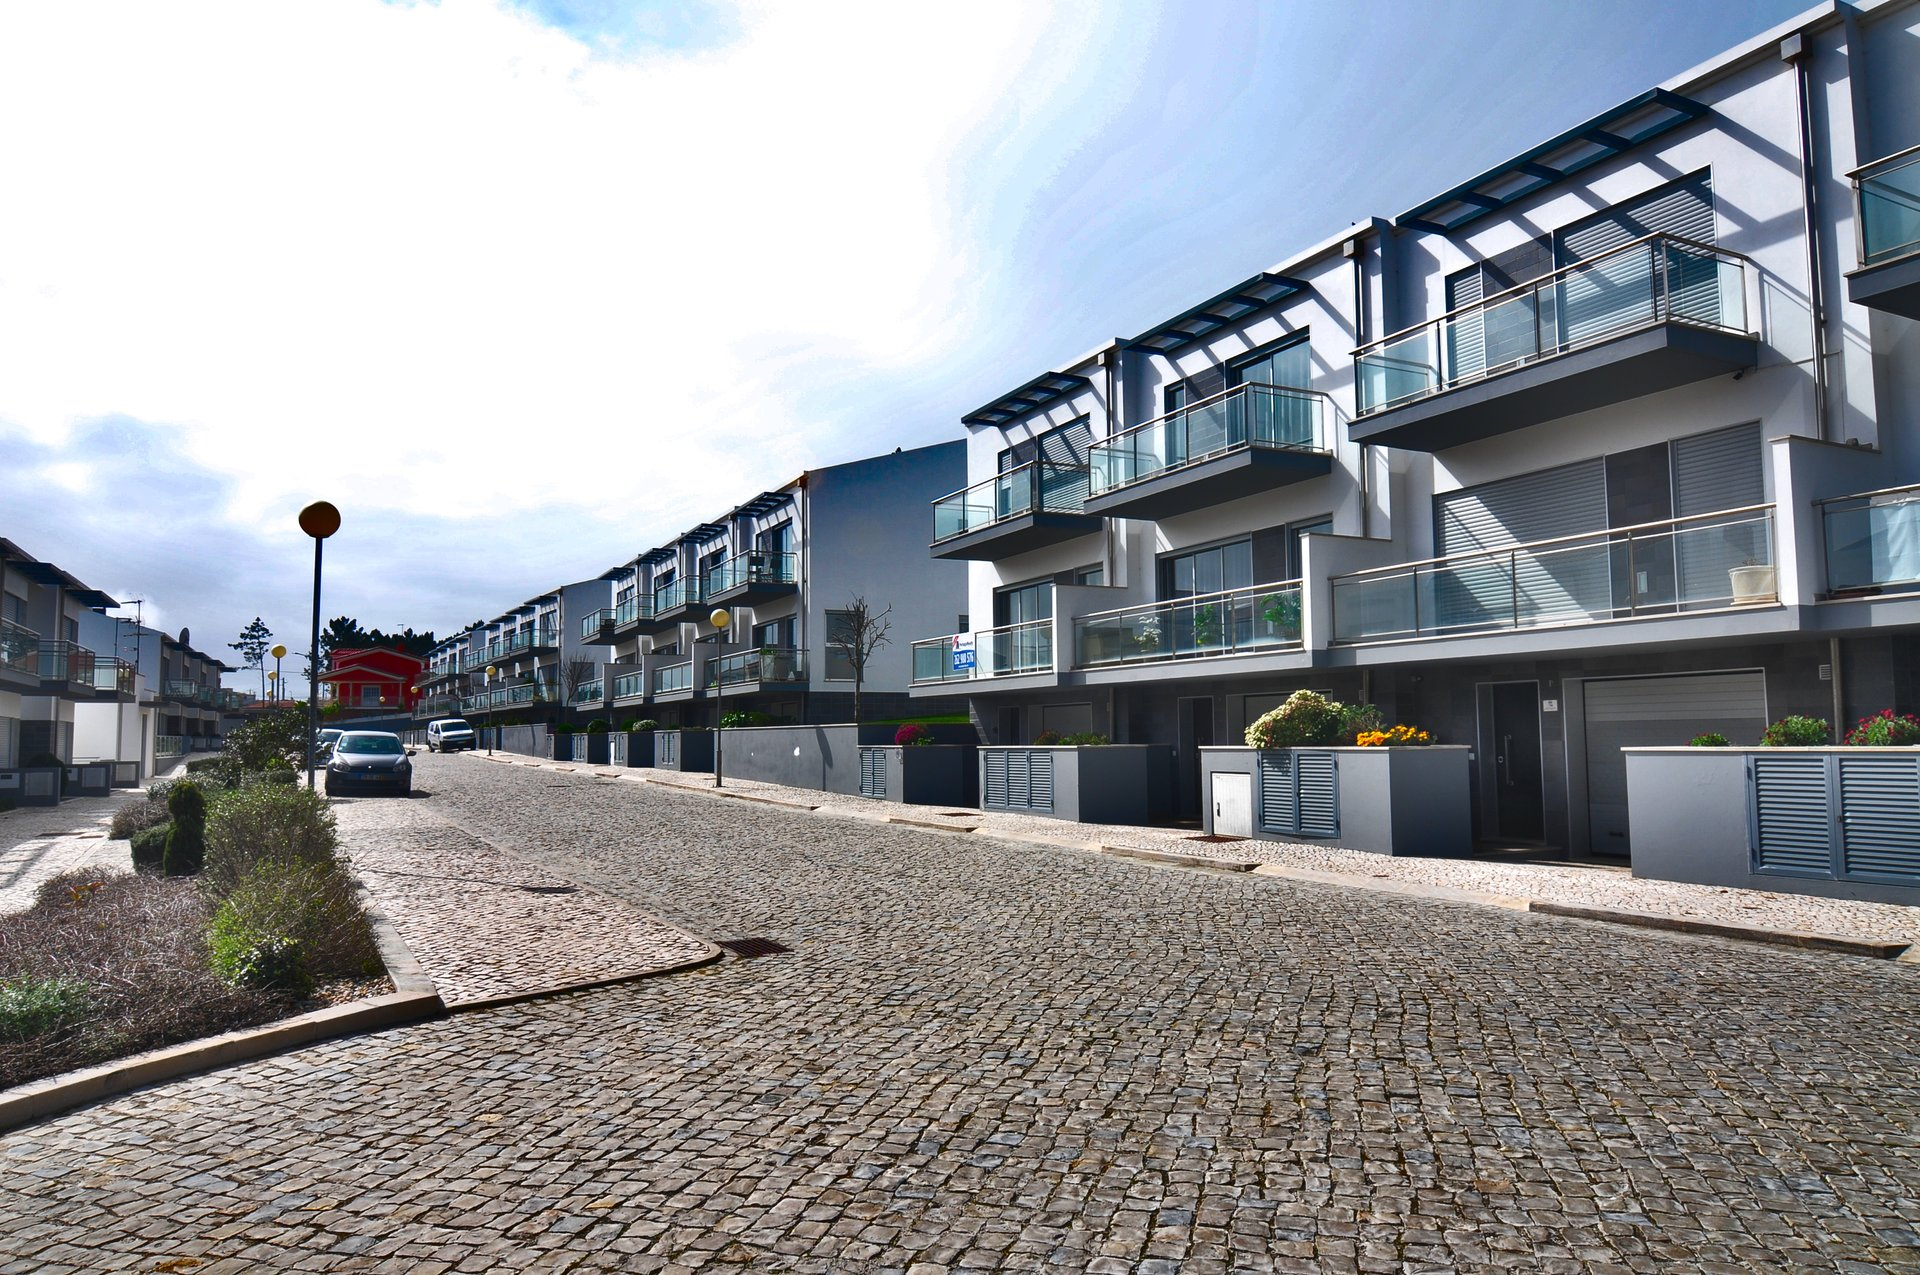 3 Bedroom Townhouse Sao Martinho do Porto, Silver Coast Ref: AV2051